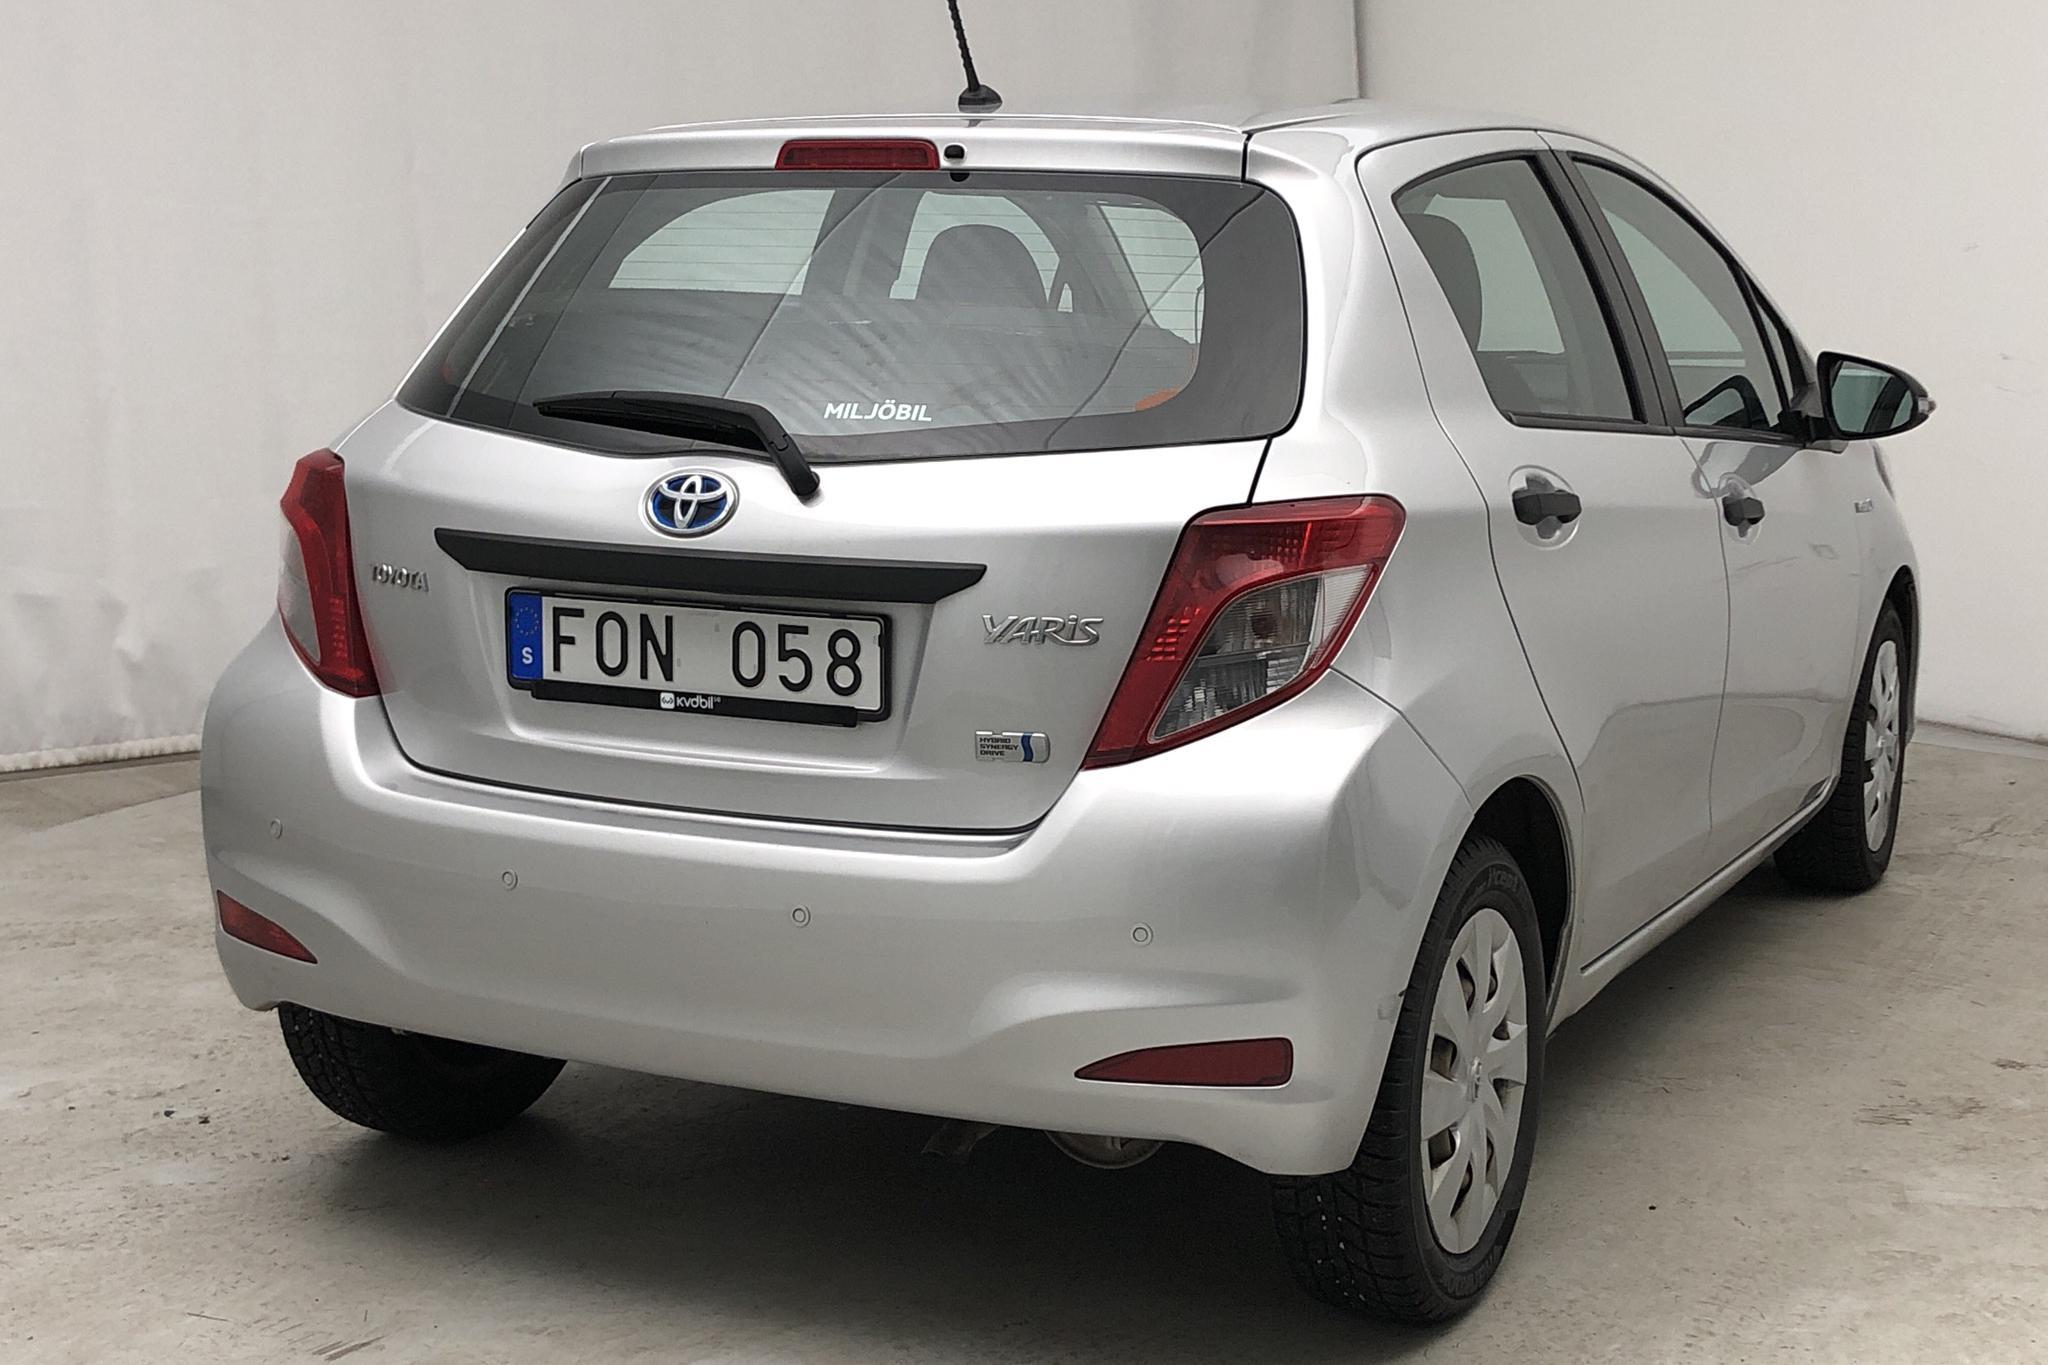 Toyota Yaris 1.5 HSD 5dr (75hk) - 94 340 km - Automatic - silver - 2013